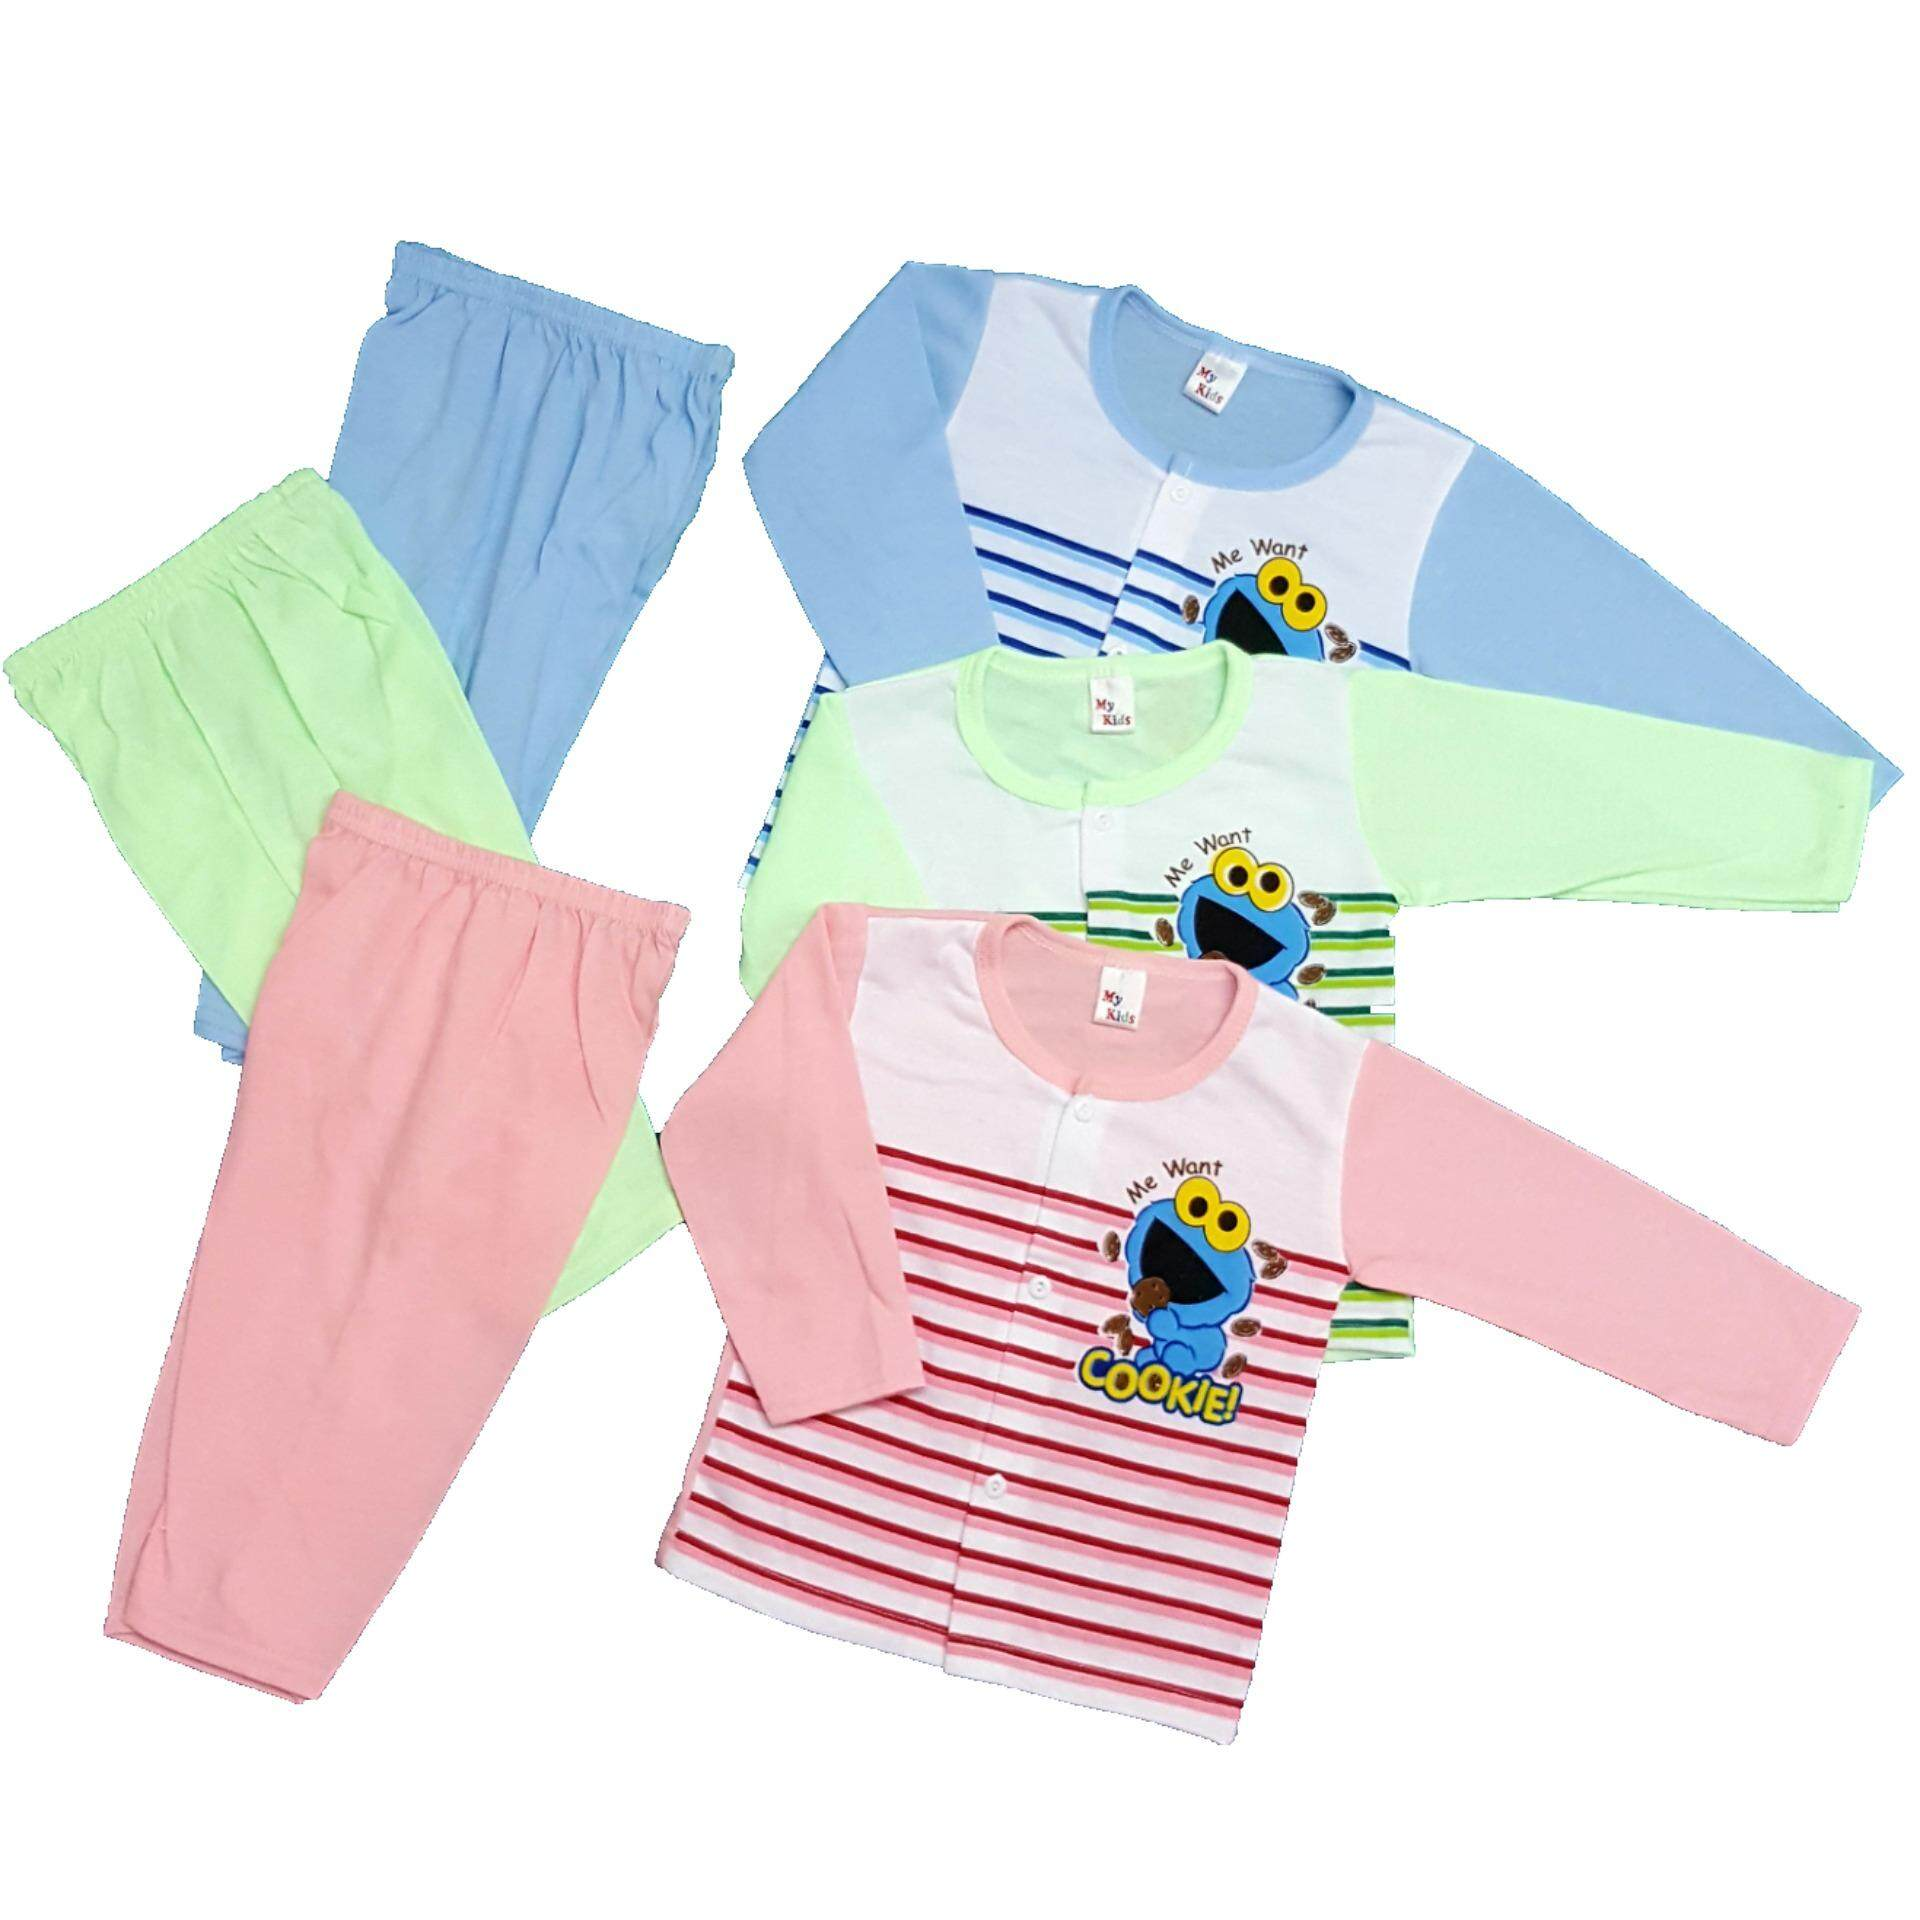 Newborn & Baby 3 SET S.S Printing Pajamas -300 (Fit to Age: 6-18Mth Mass:8-12kg Height:69-80CM)